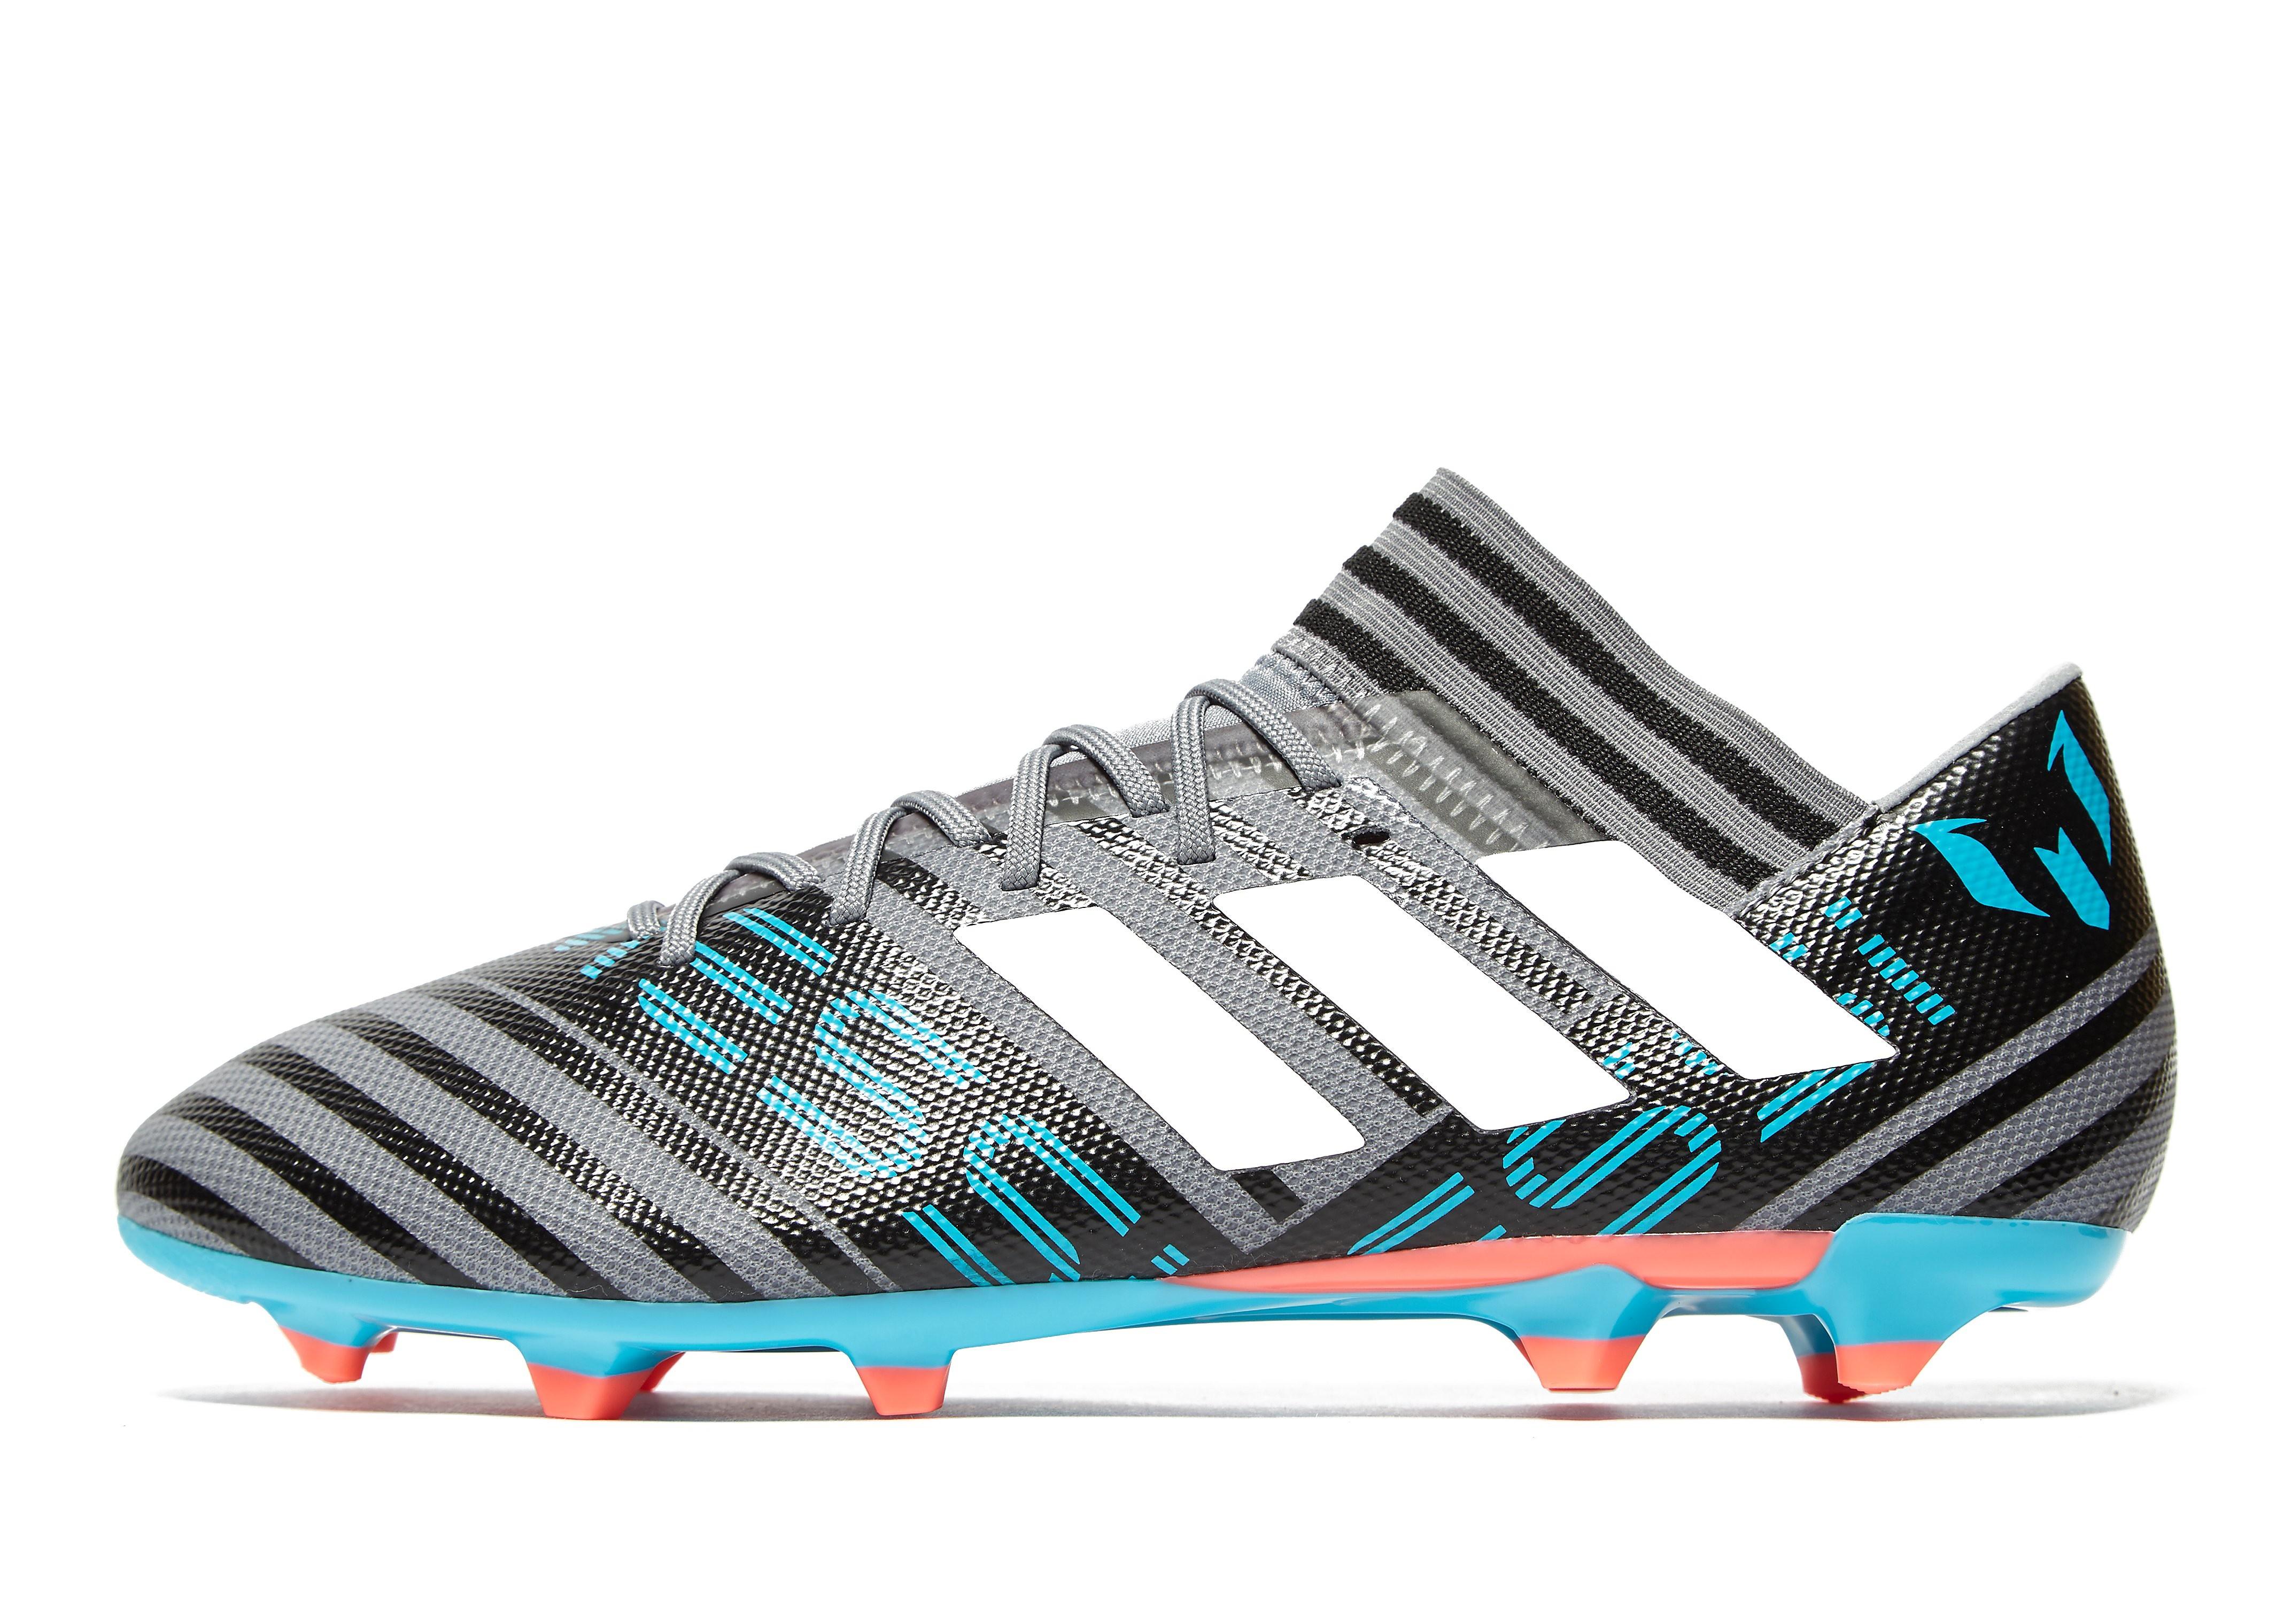 adidas Cold Blooded Nemeziz Messi 17.3 FG